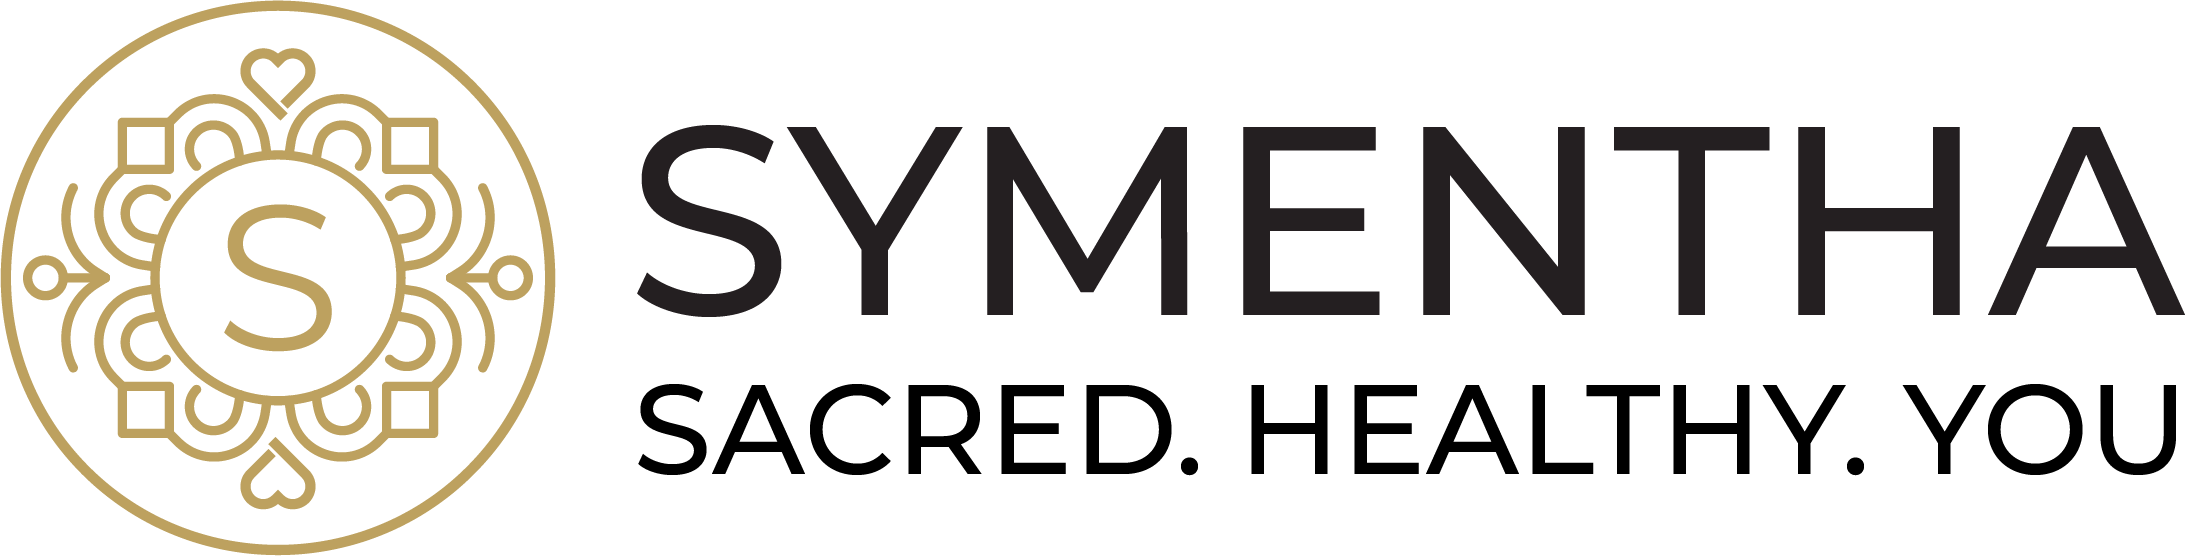 Symentha Holmes - Healthy Conscious You!